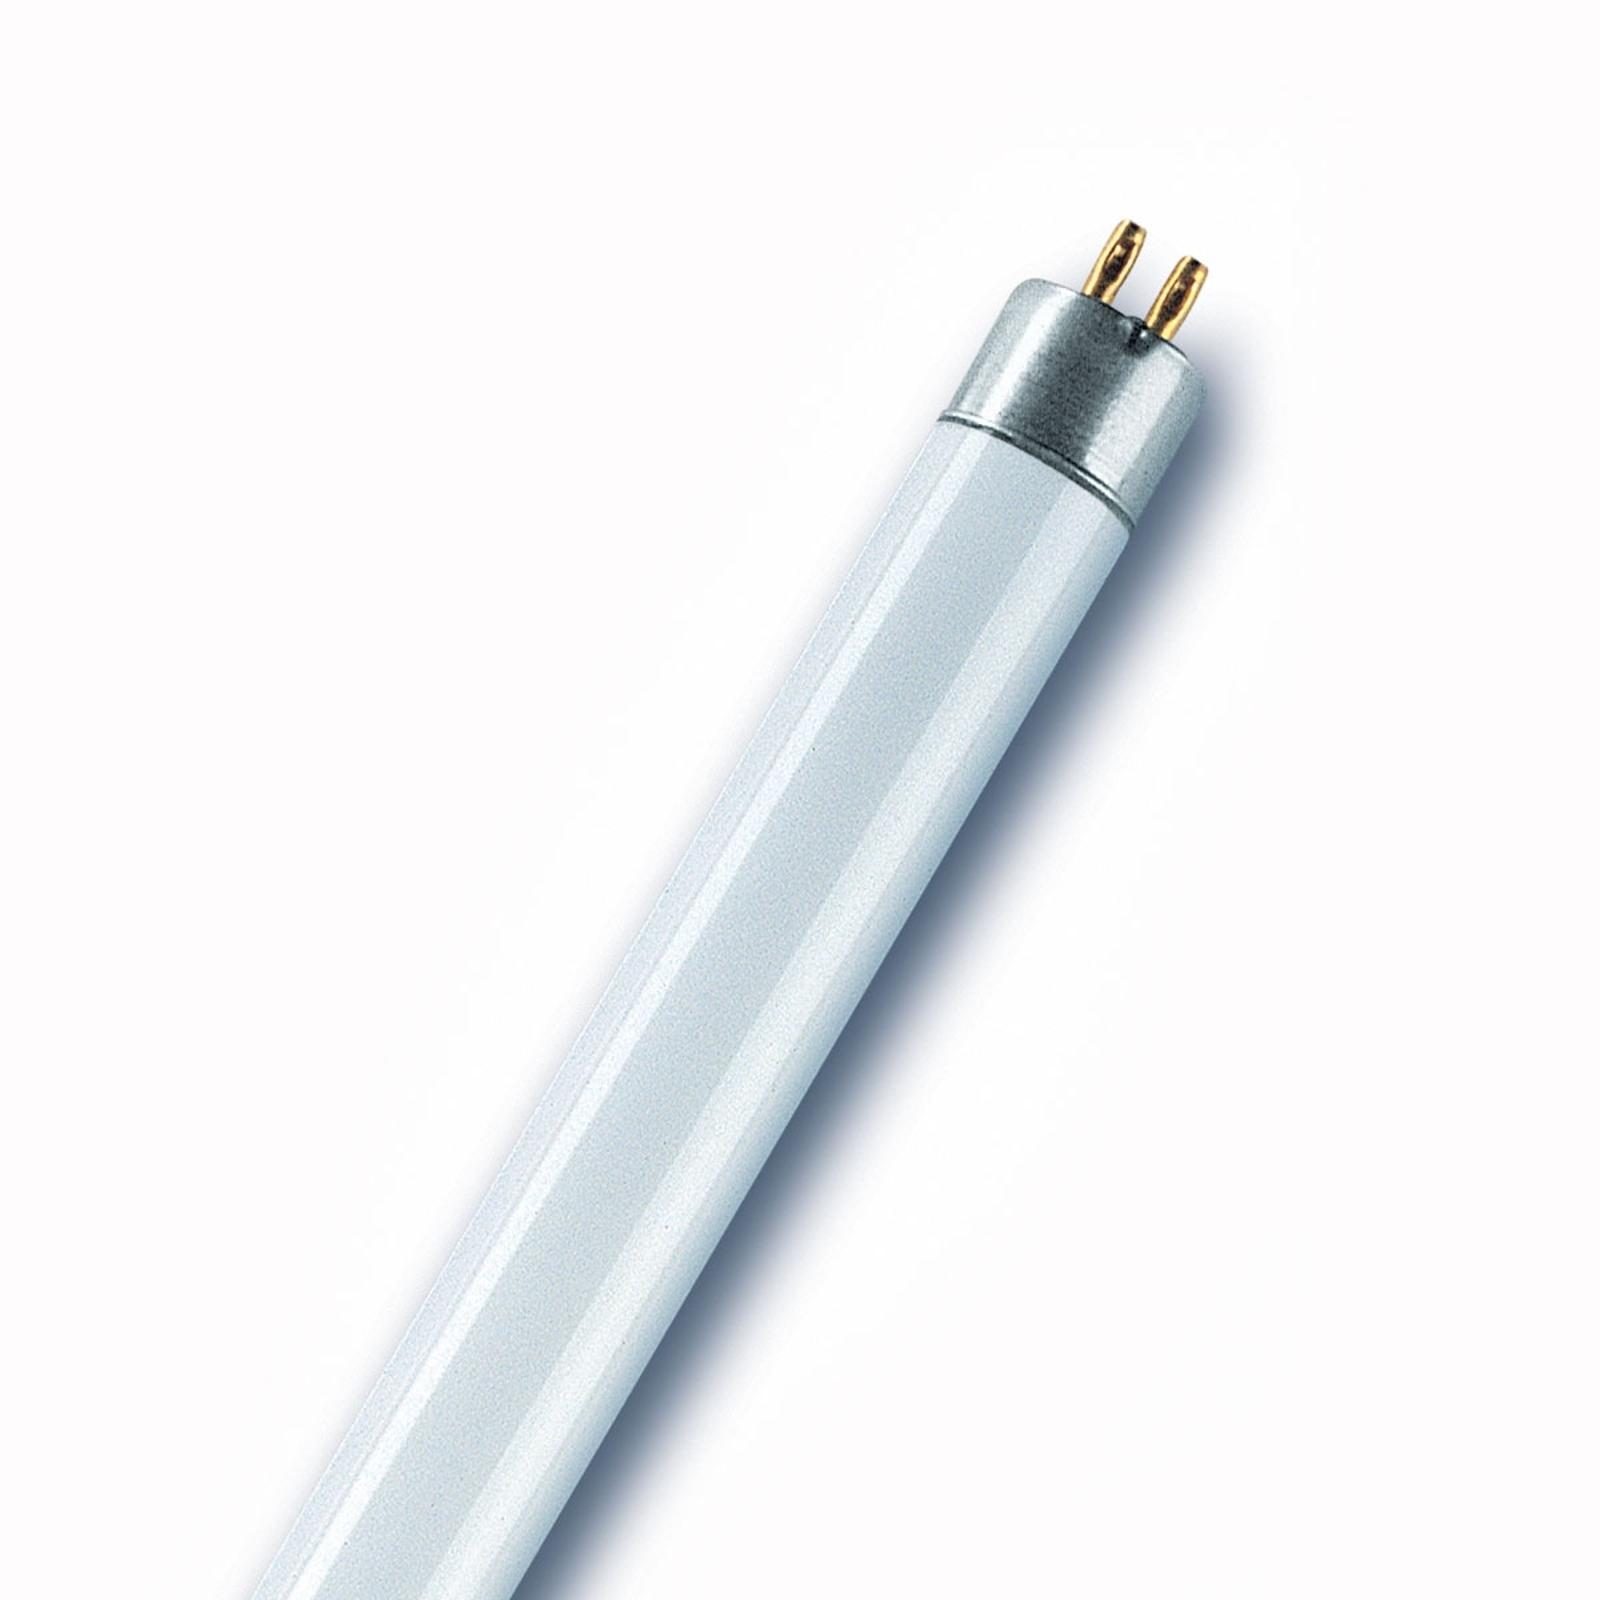 Leuchtstoffröhre G5 T5 49W 840 Lumilux HO